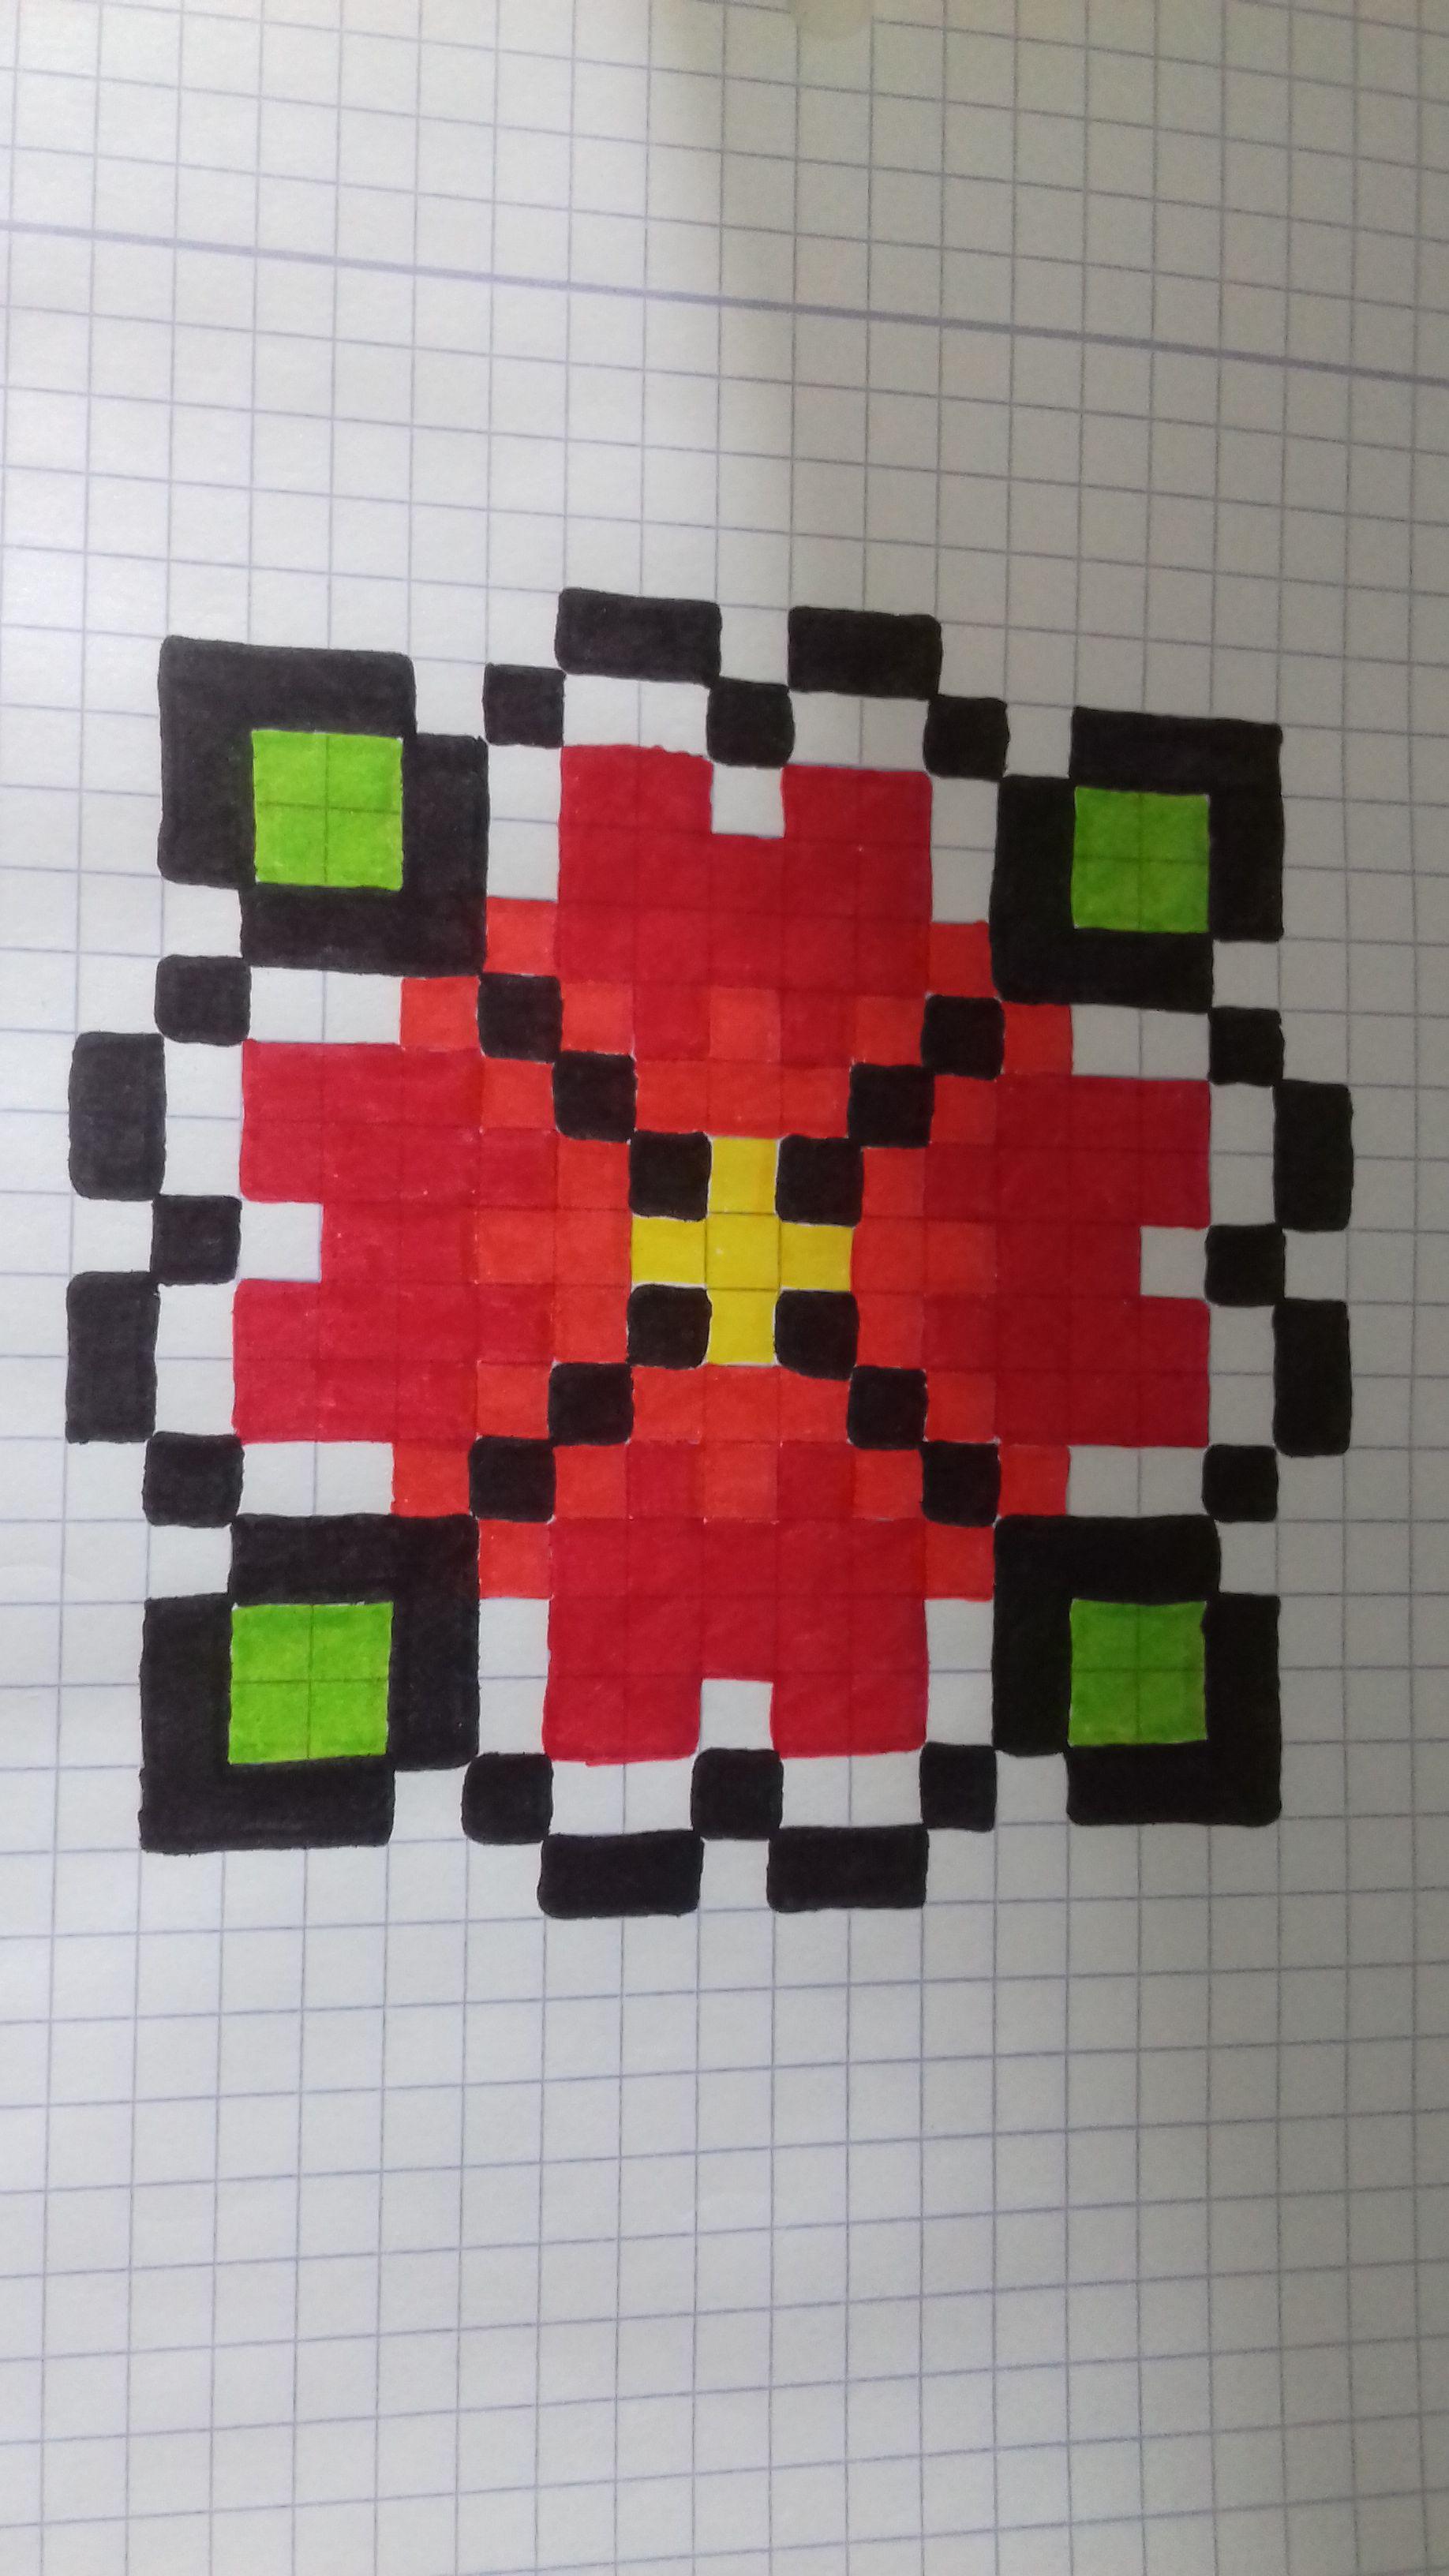 Epingle Par Luli 22 Sur Desene Dessin Petit Carreau Dessin Pixel Art Facile Coloriage Pixel